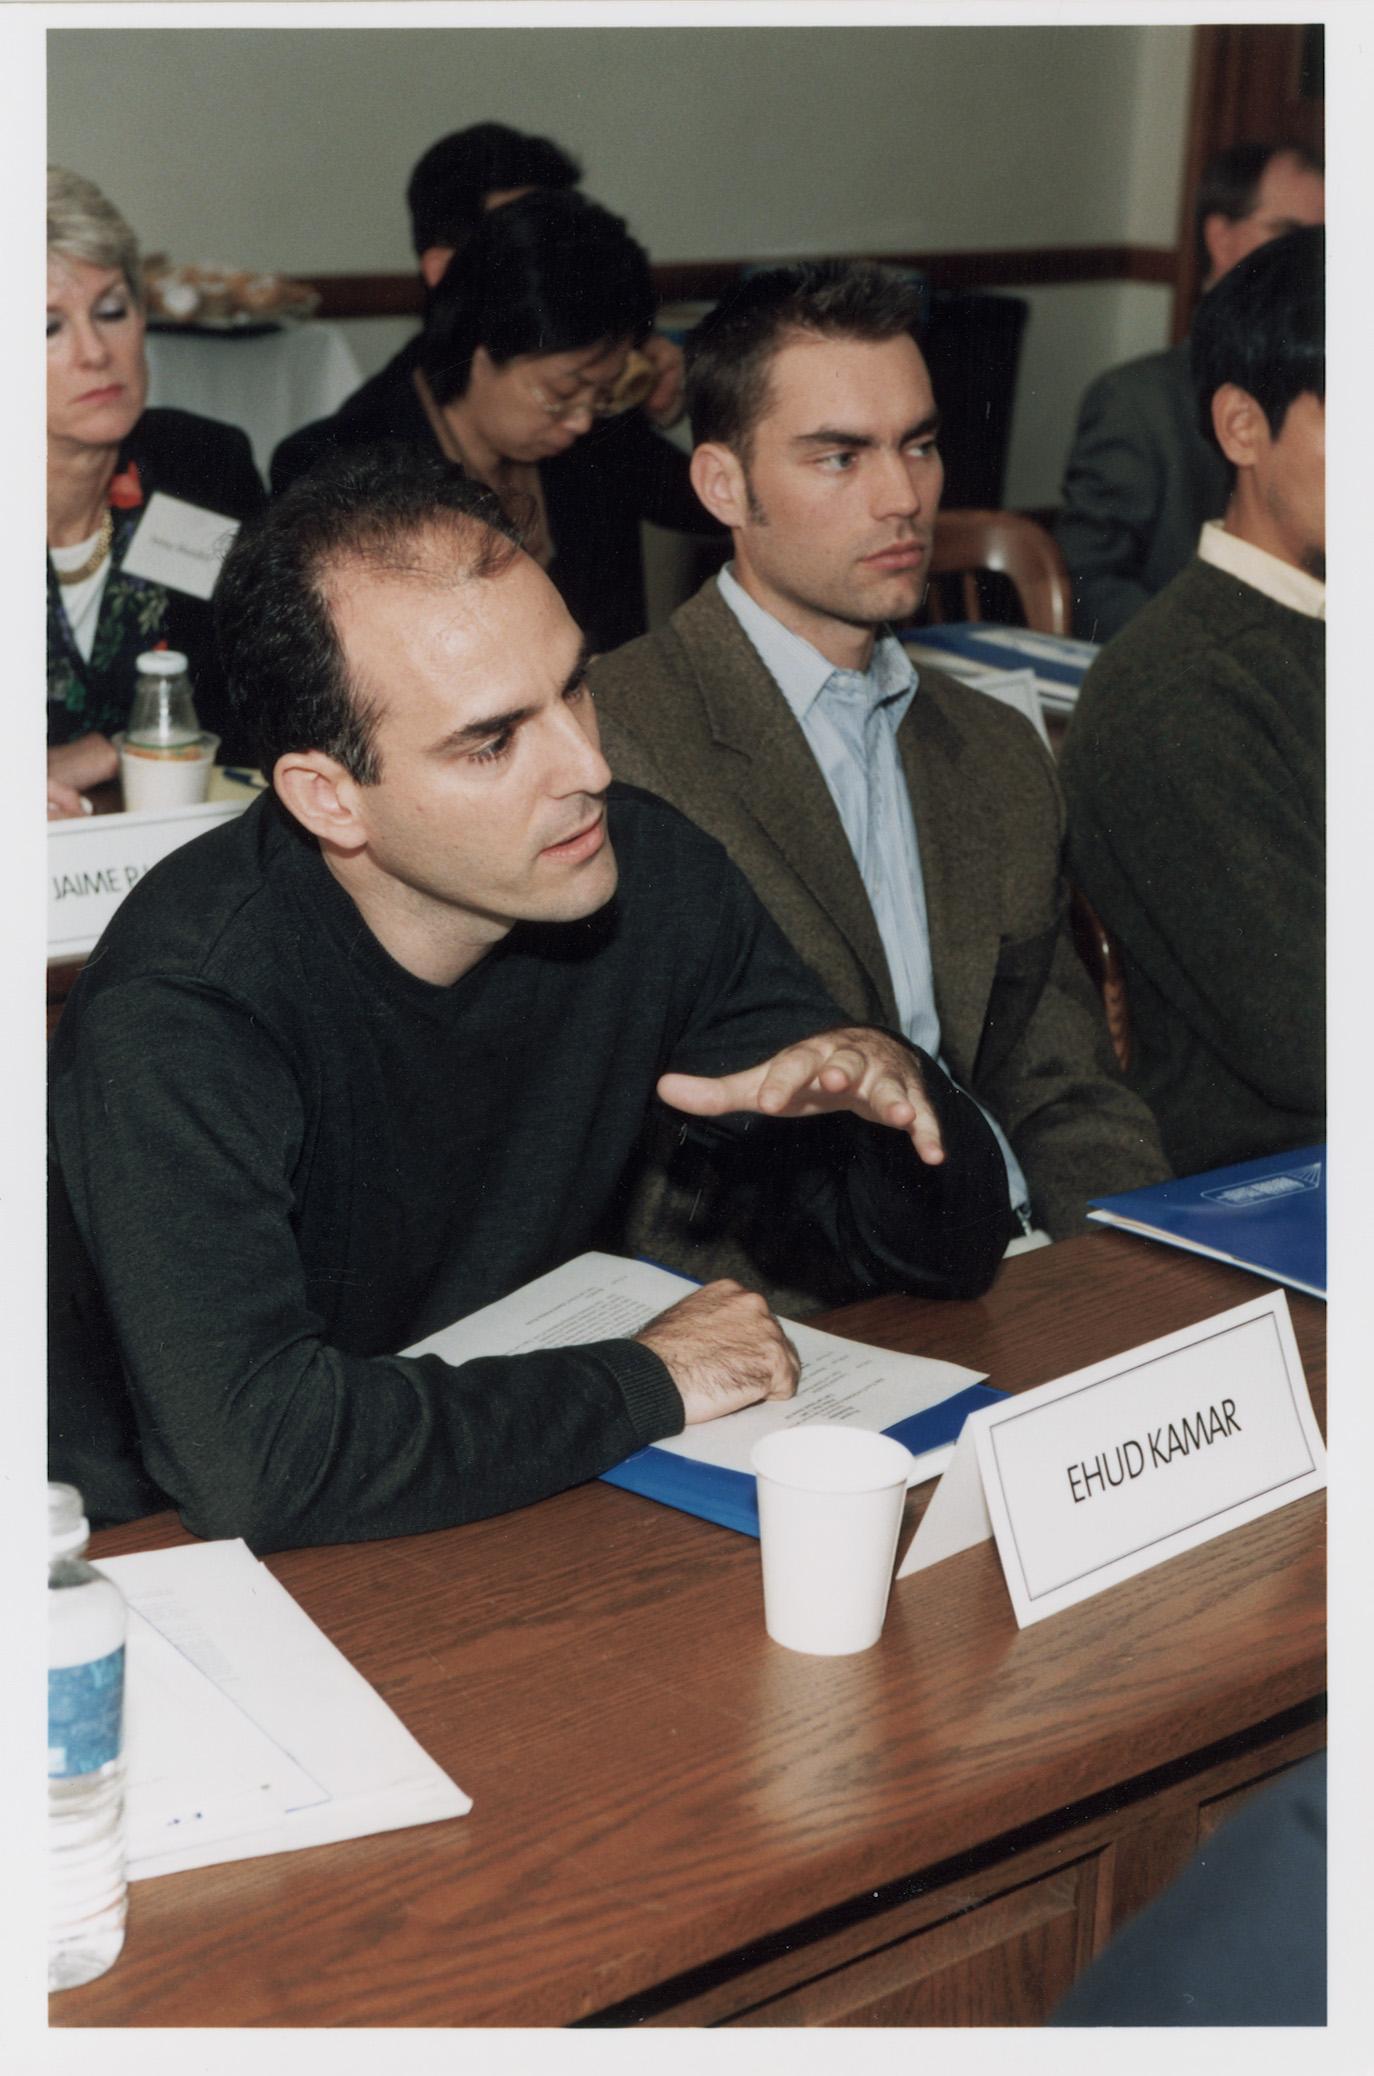 U. Southern Cal. Law Prof. Ehud Kamar